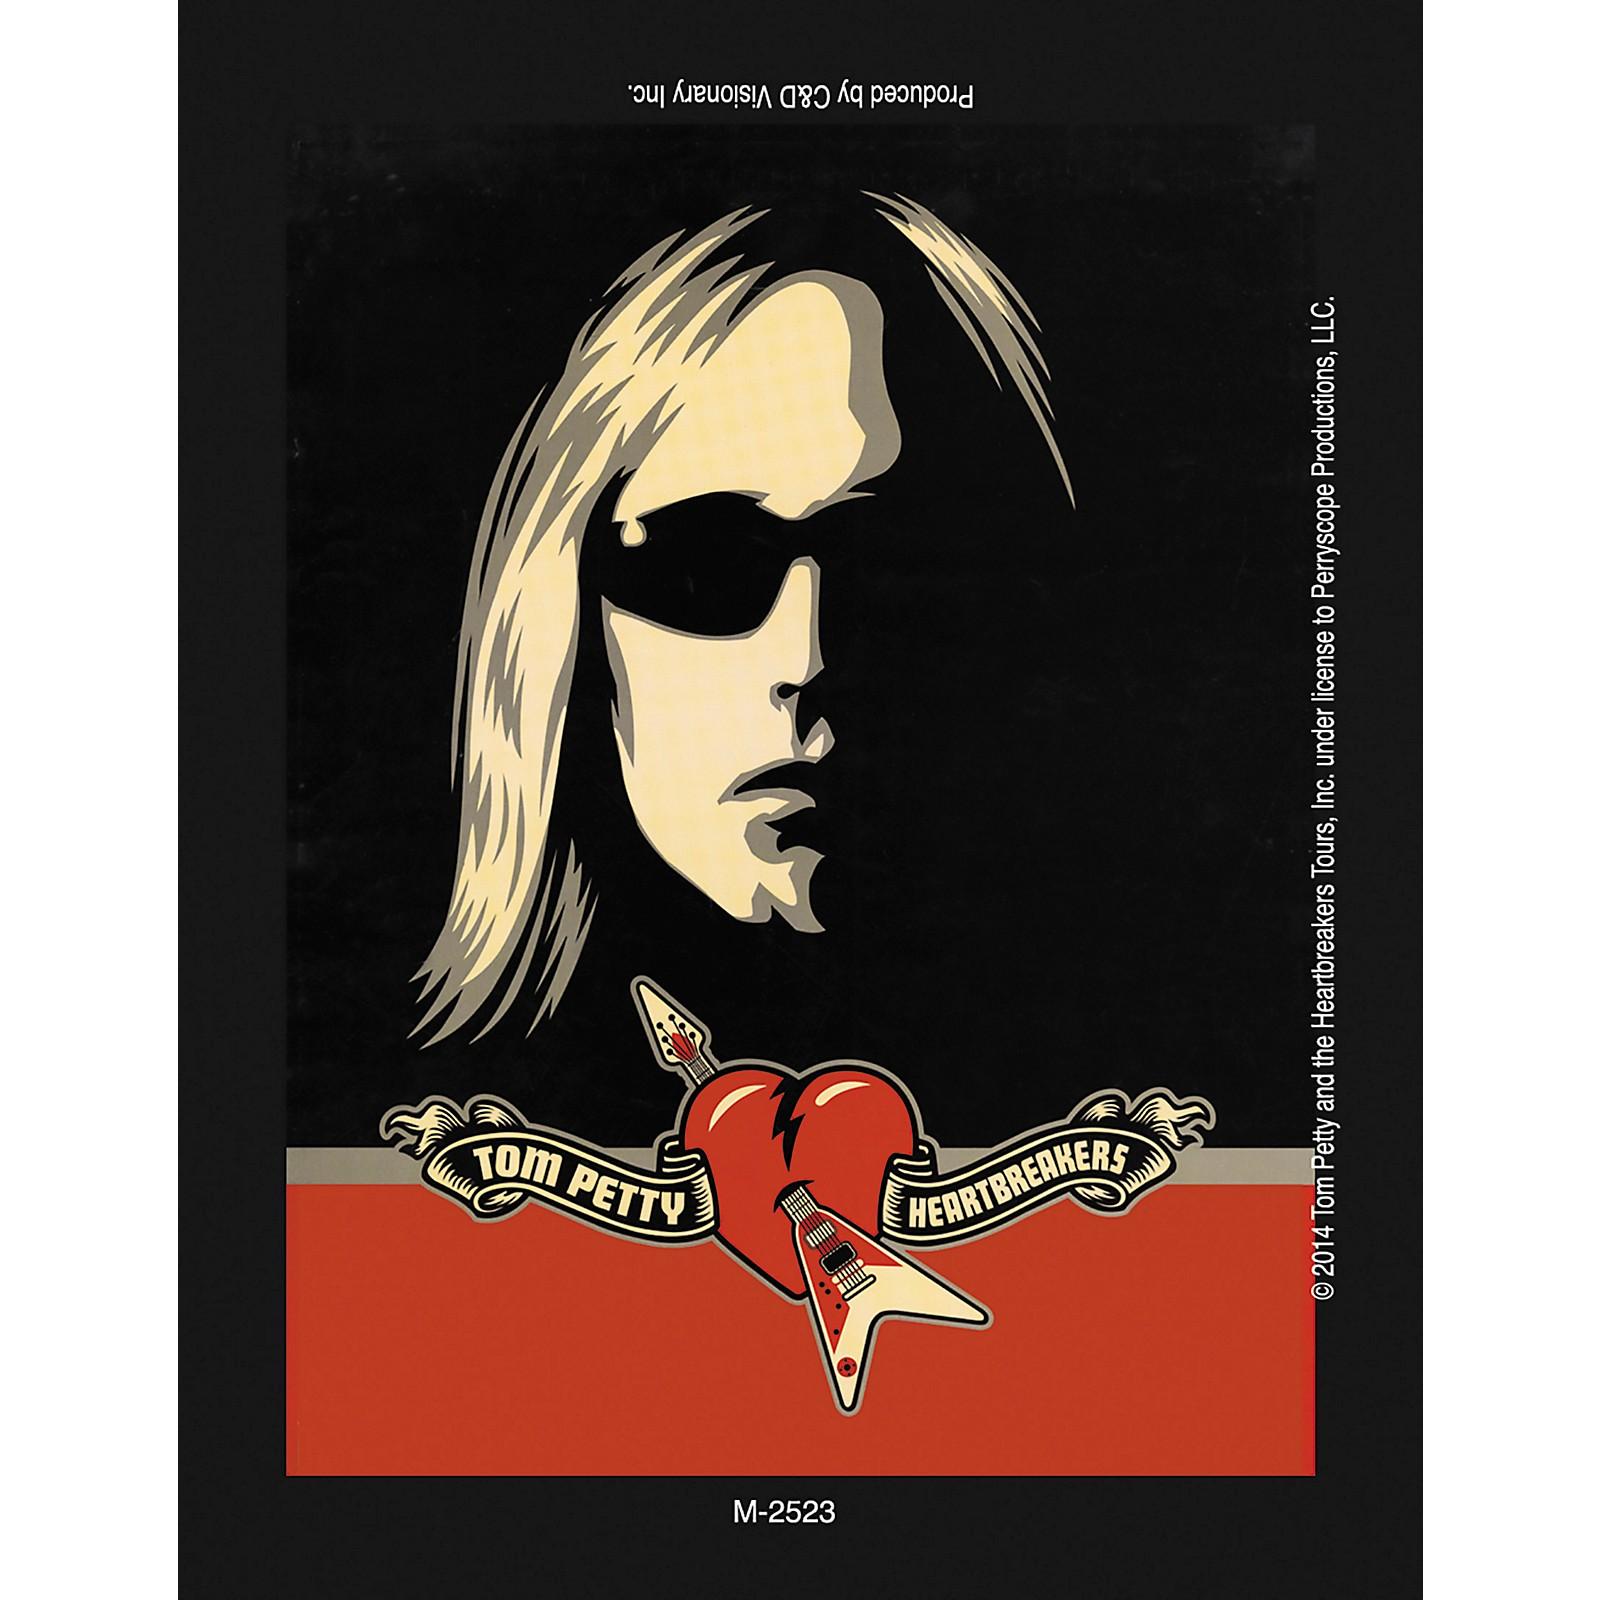 C&D Visionary Tom Petty Magnet